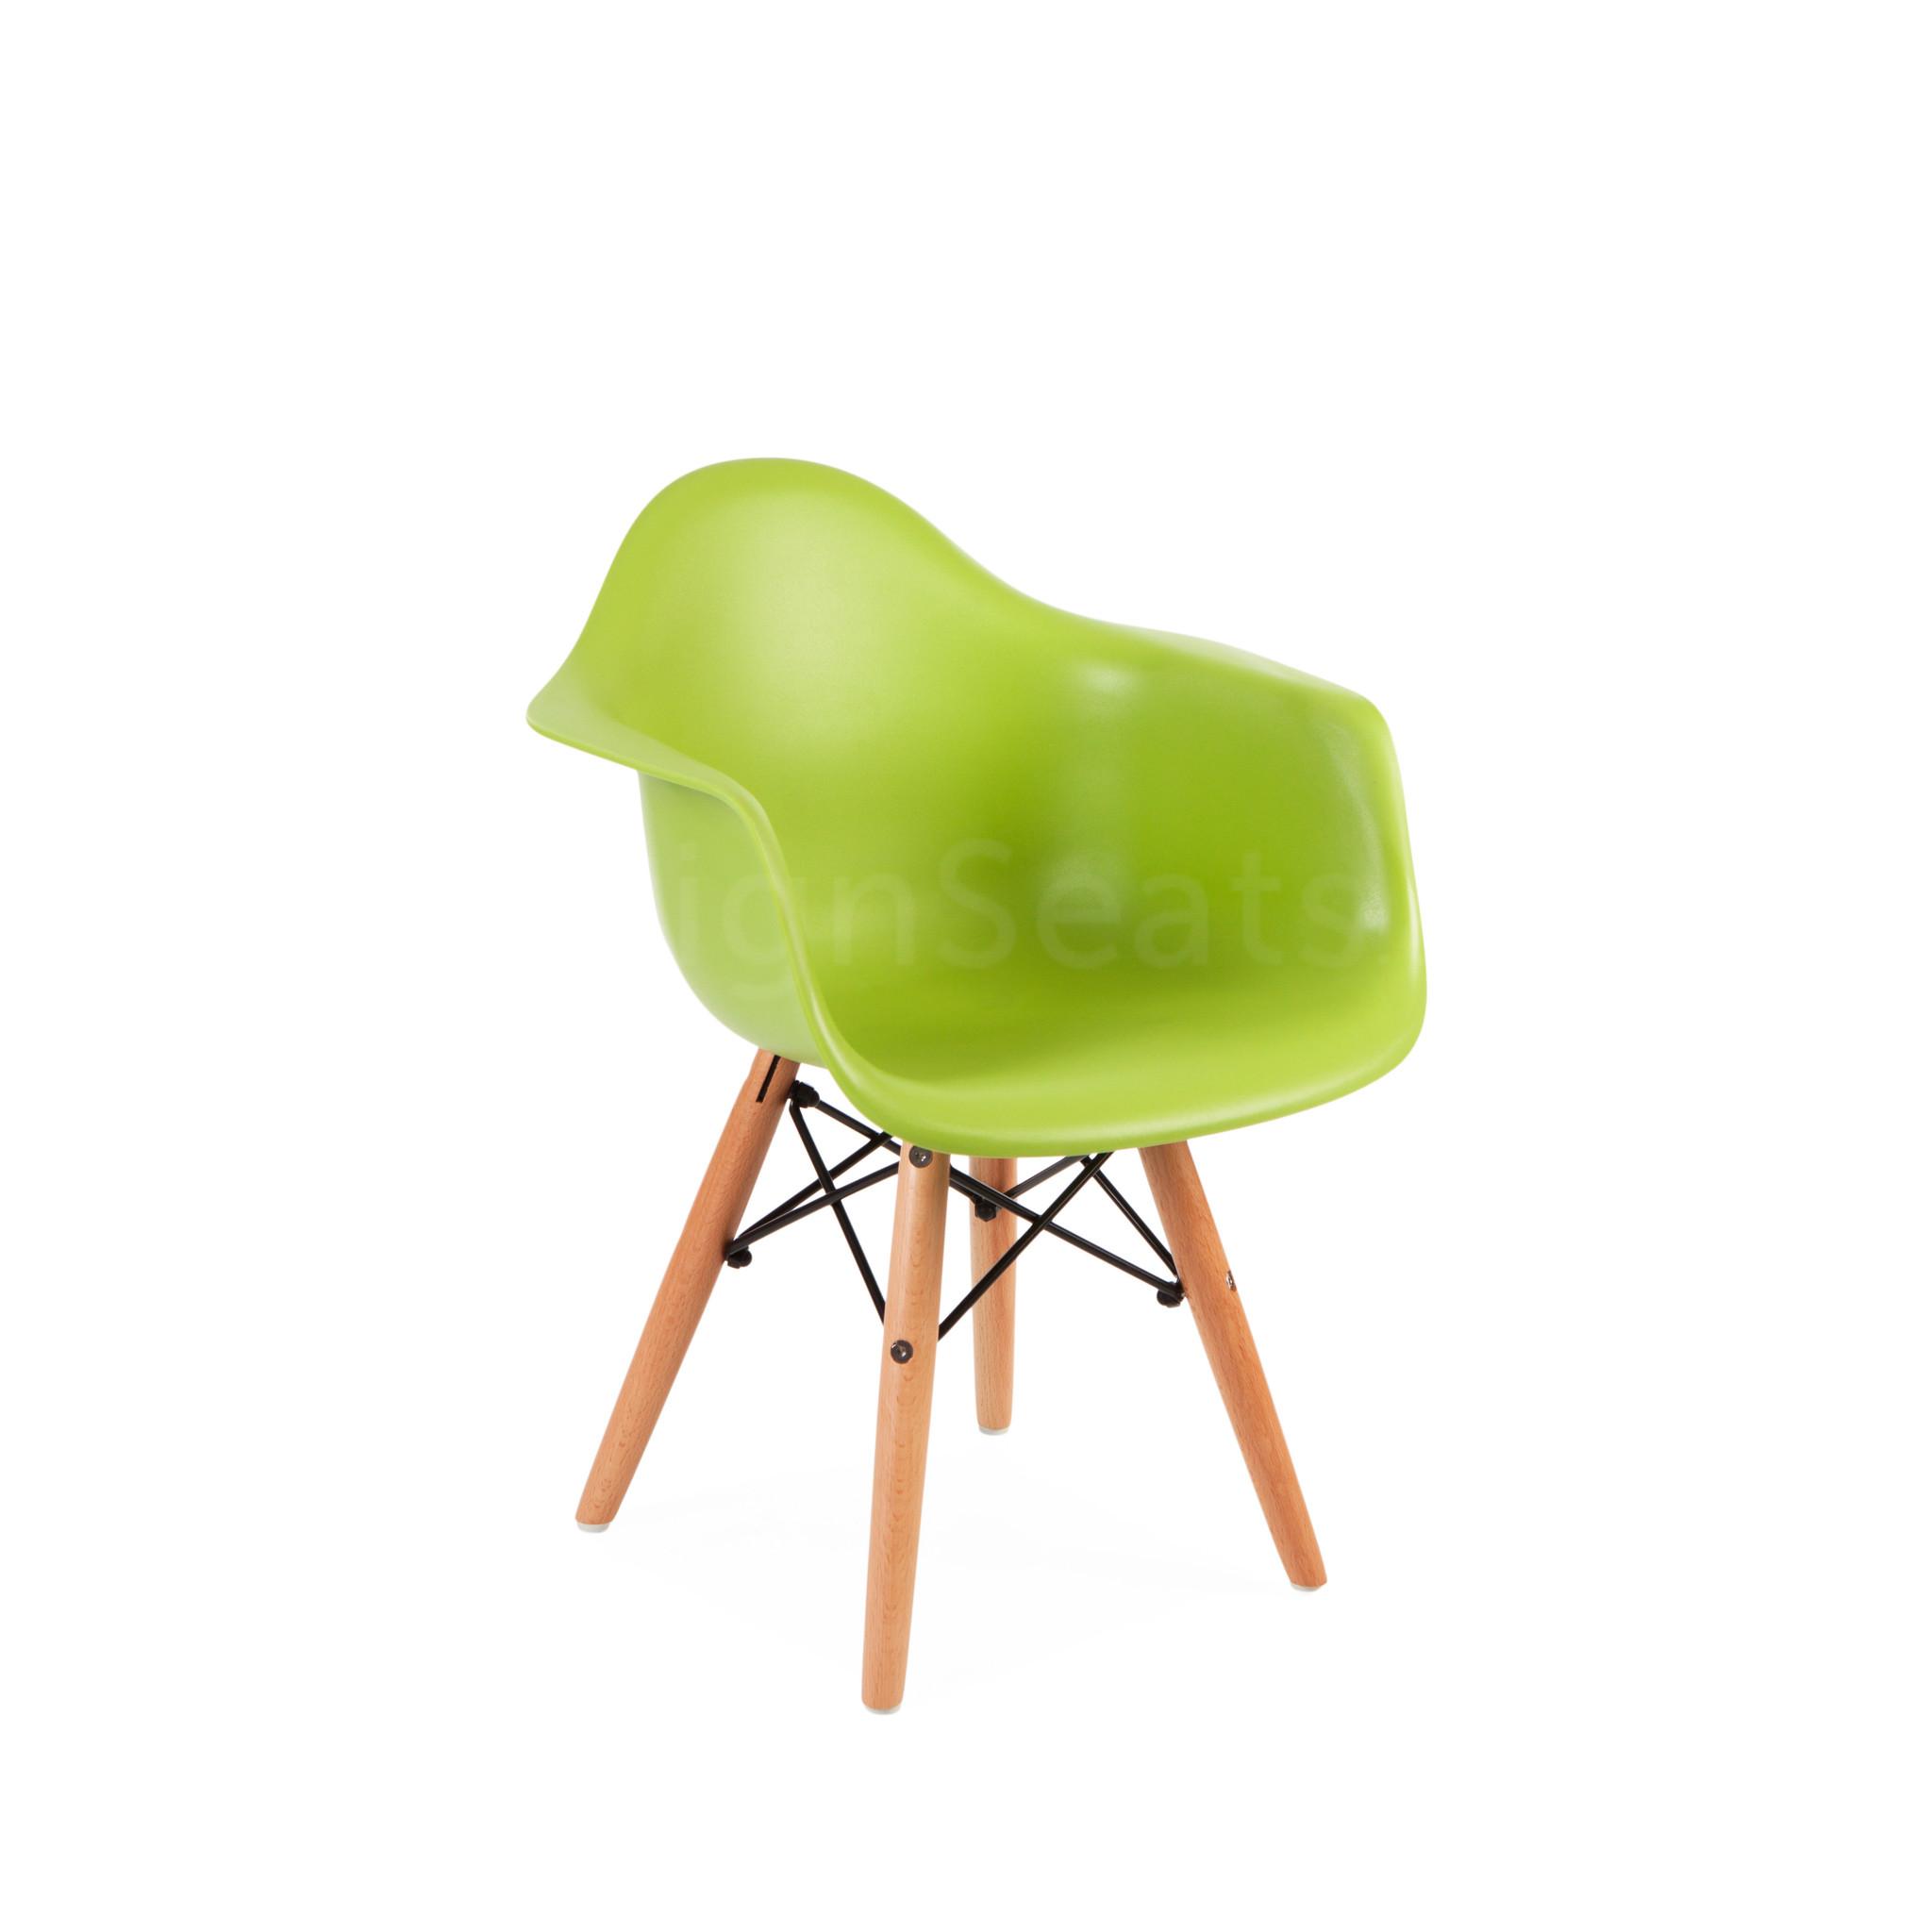 DAW Eames Design Kinderstoel